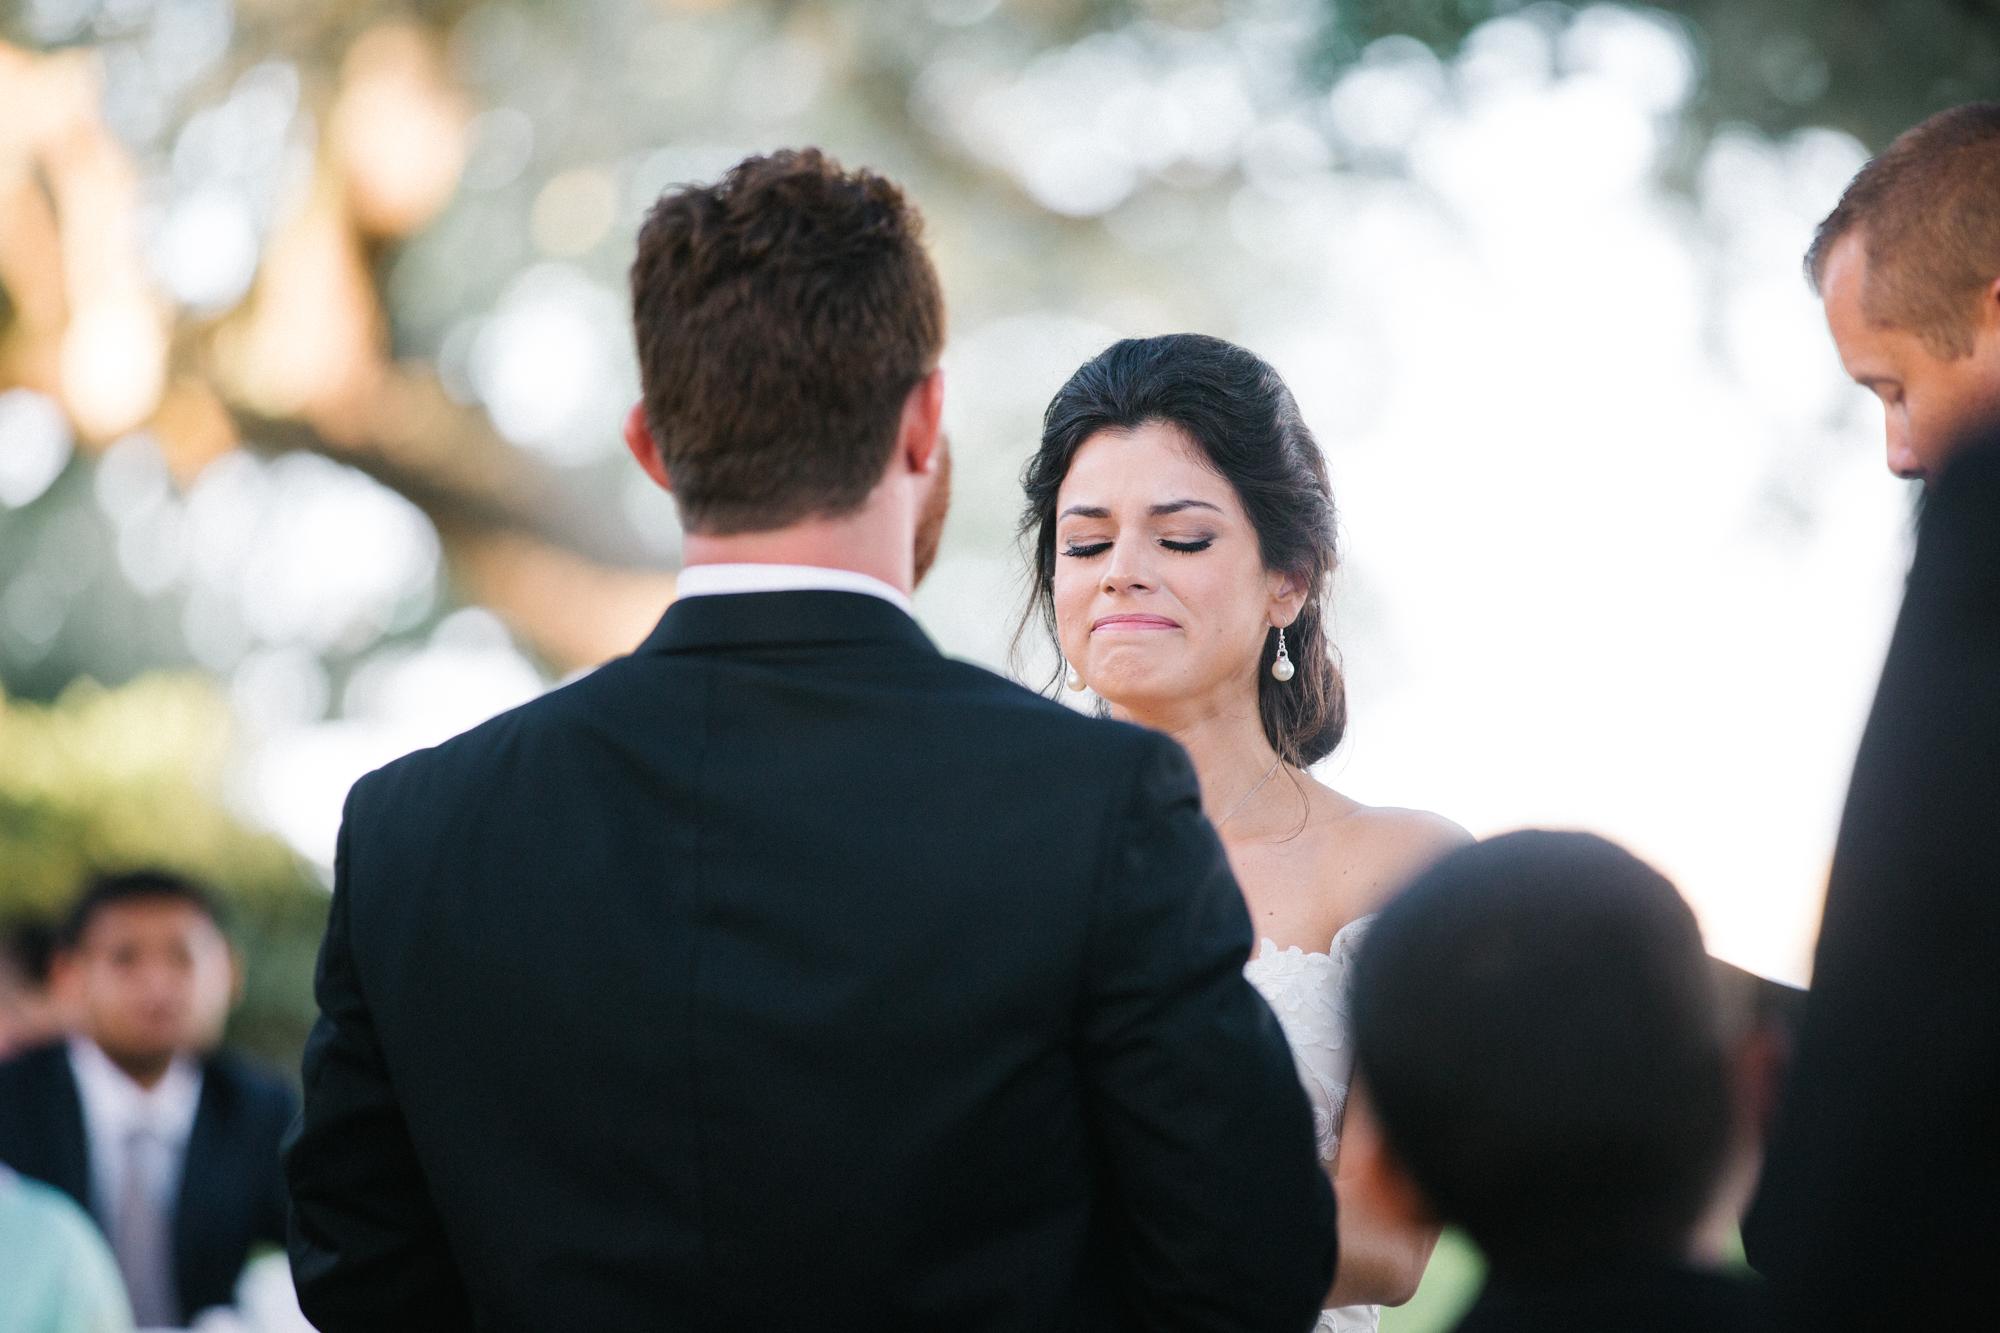 Gautier_Wedding_Photographer-117.jpg